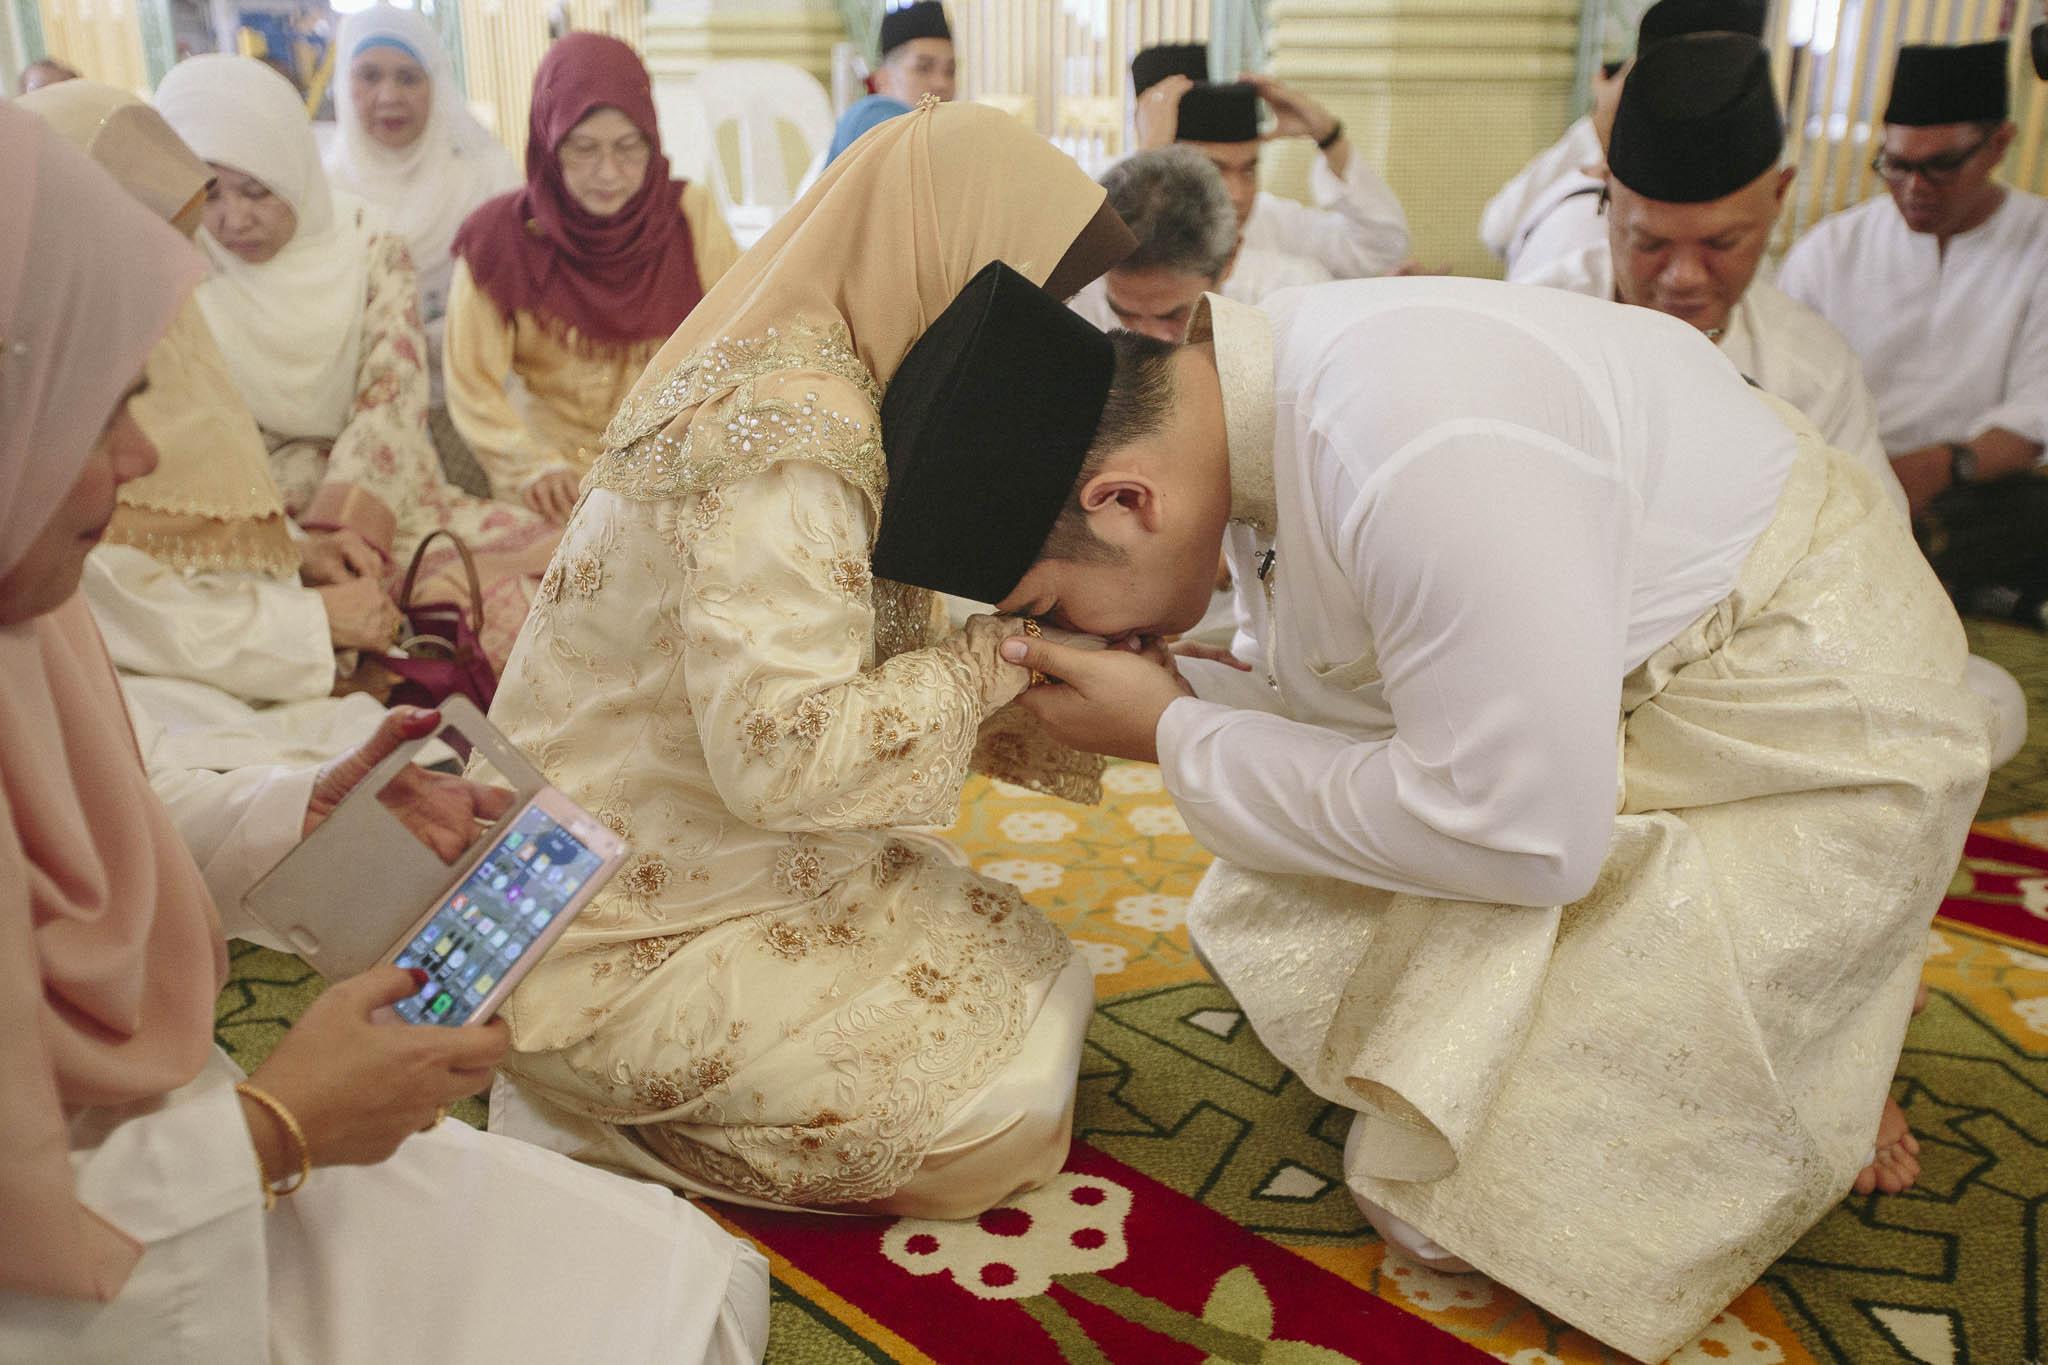 singapore-wedding-photographer-travel-khairul-atikah-19.jpg